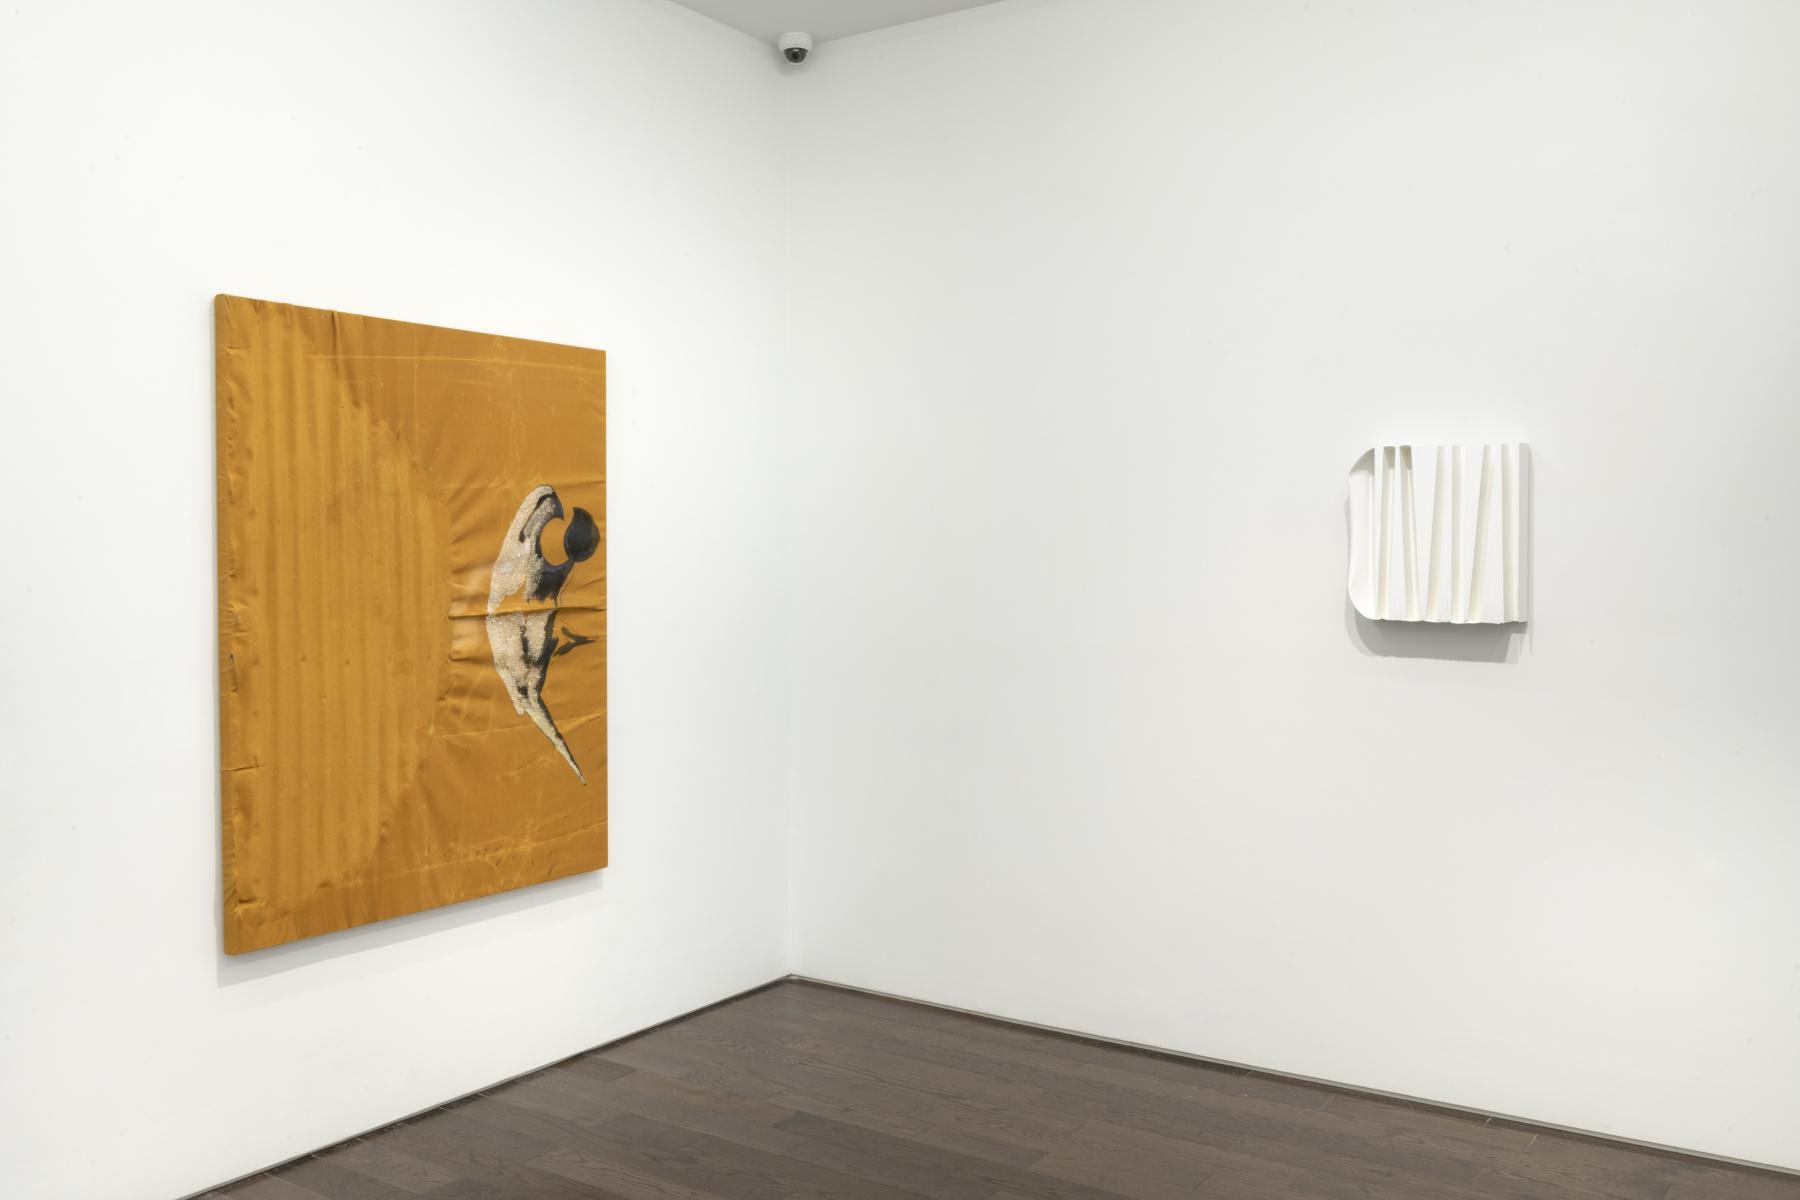 Exhibition View Wrecked Angle Ceysson & Bénétière New York 2021 (9)